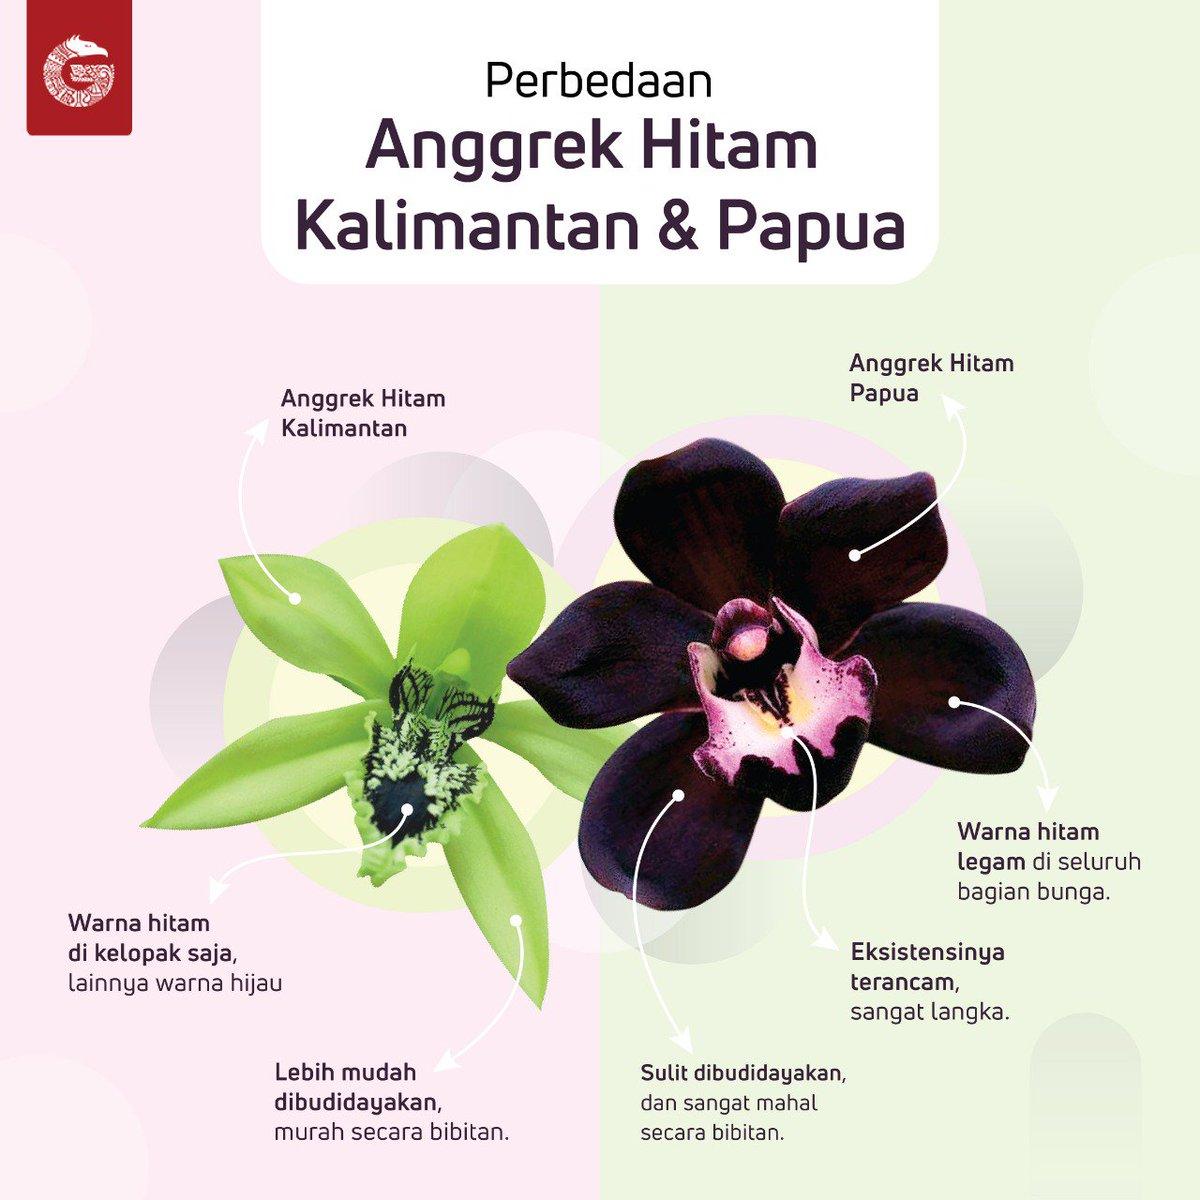 76+ Gambar Anggrek Hitam Kalimantan Paling Hist